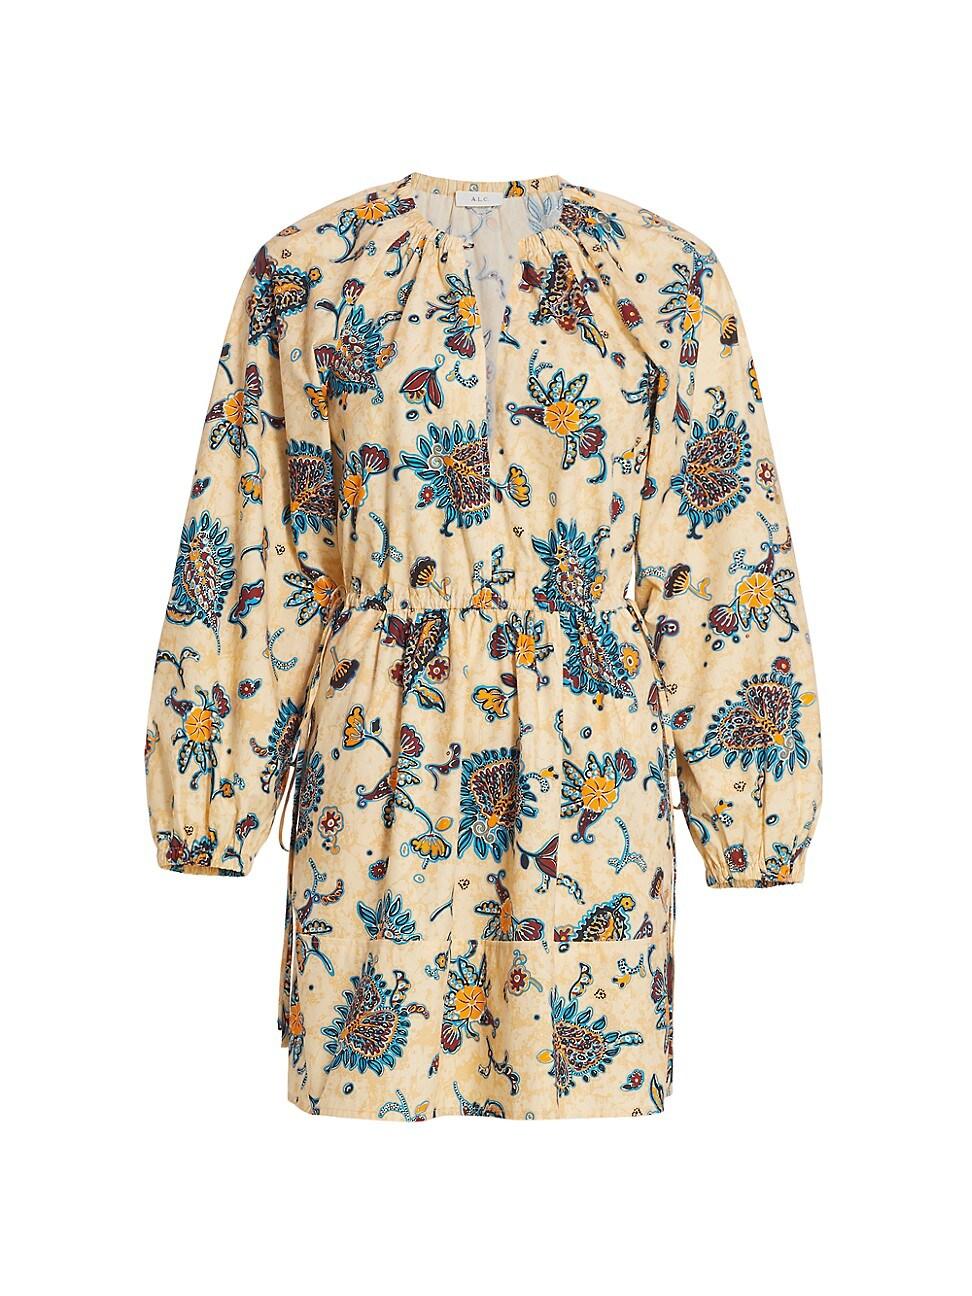 A.l.c WOMEN'S MYRA PAISLEY SHIFT DRESS